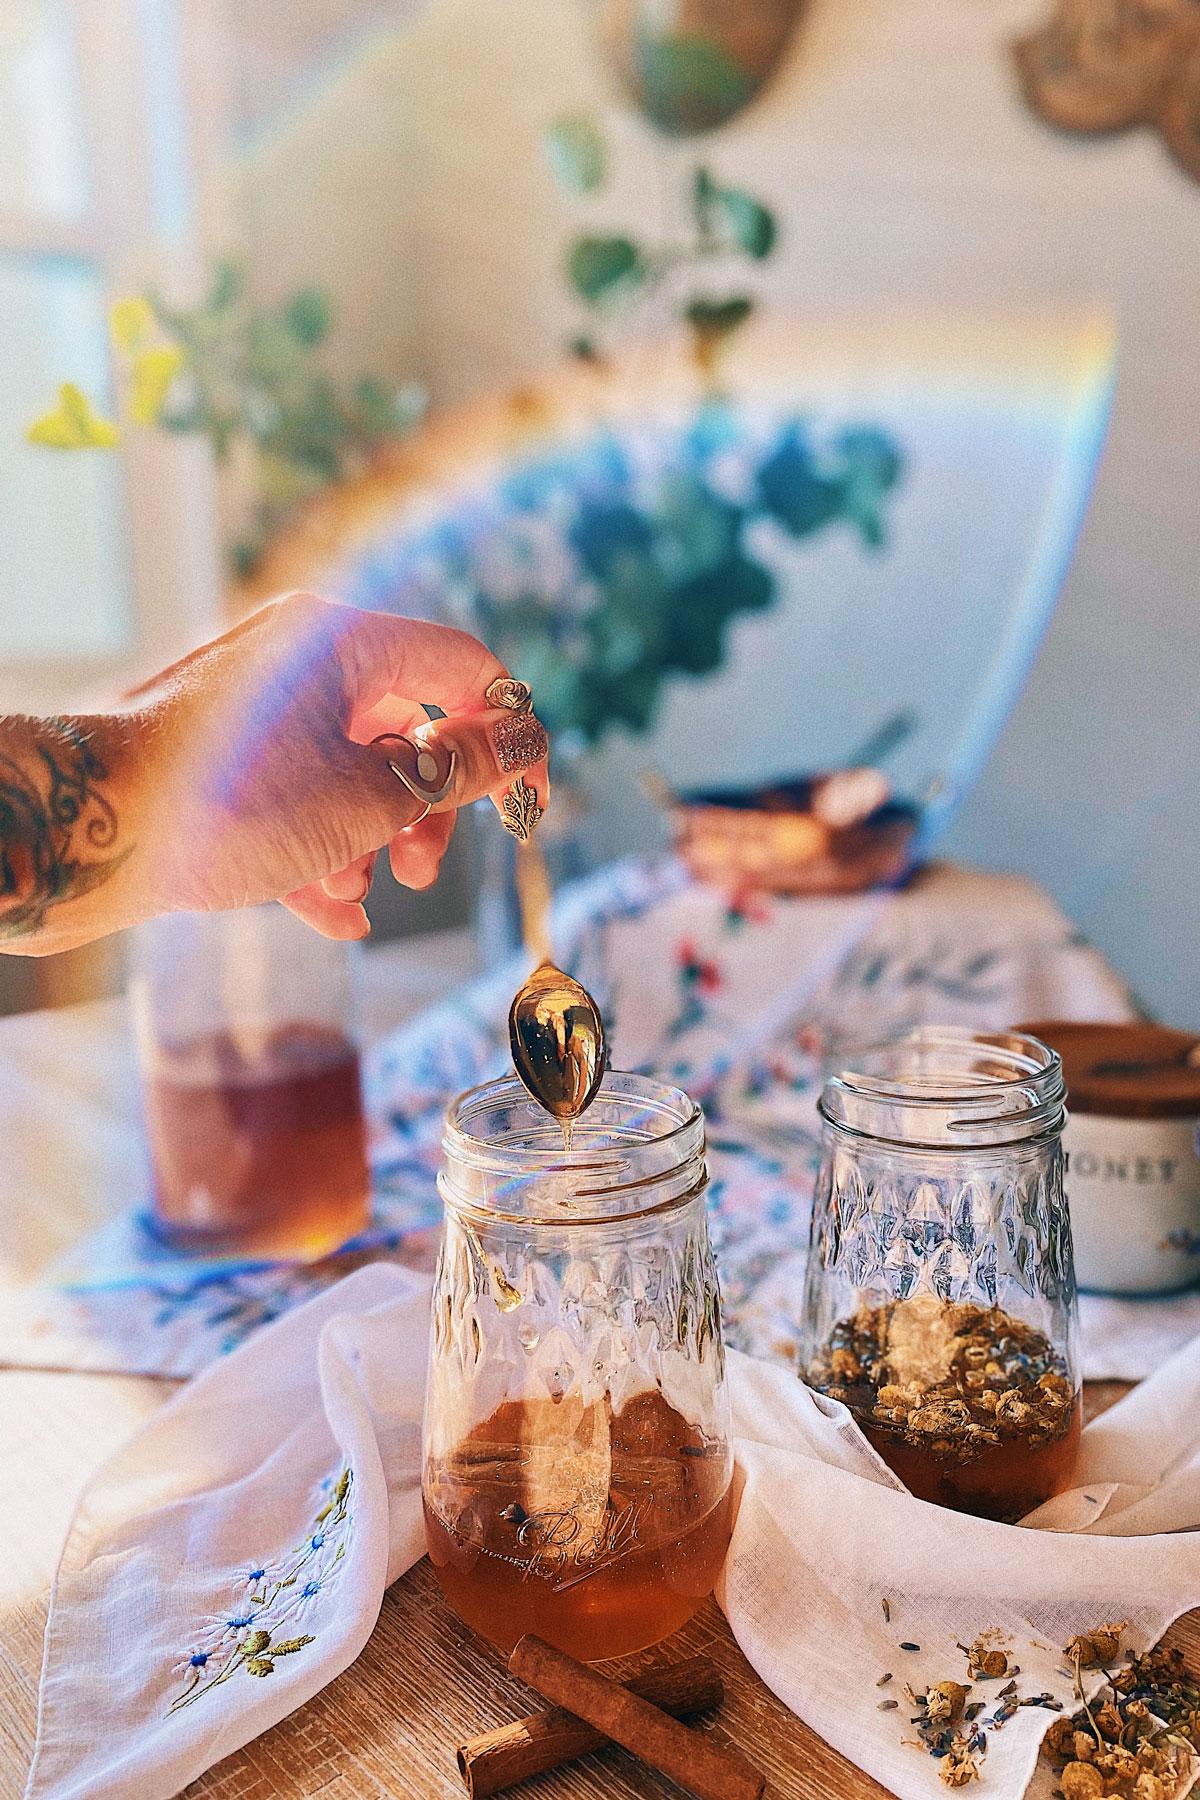 Heather Skasick Pantry Potions herbal recipes